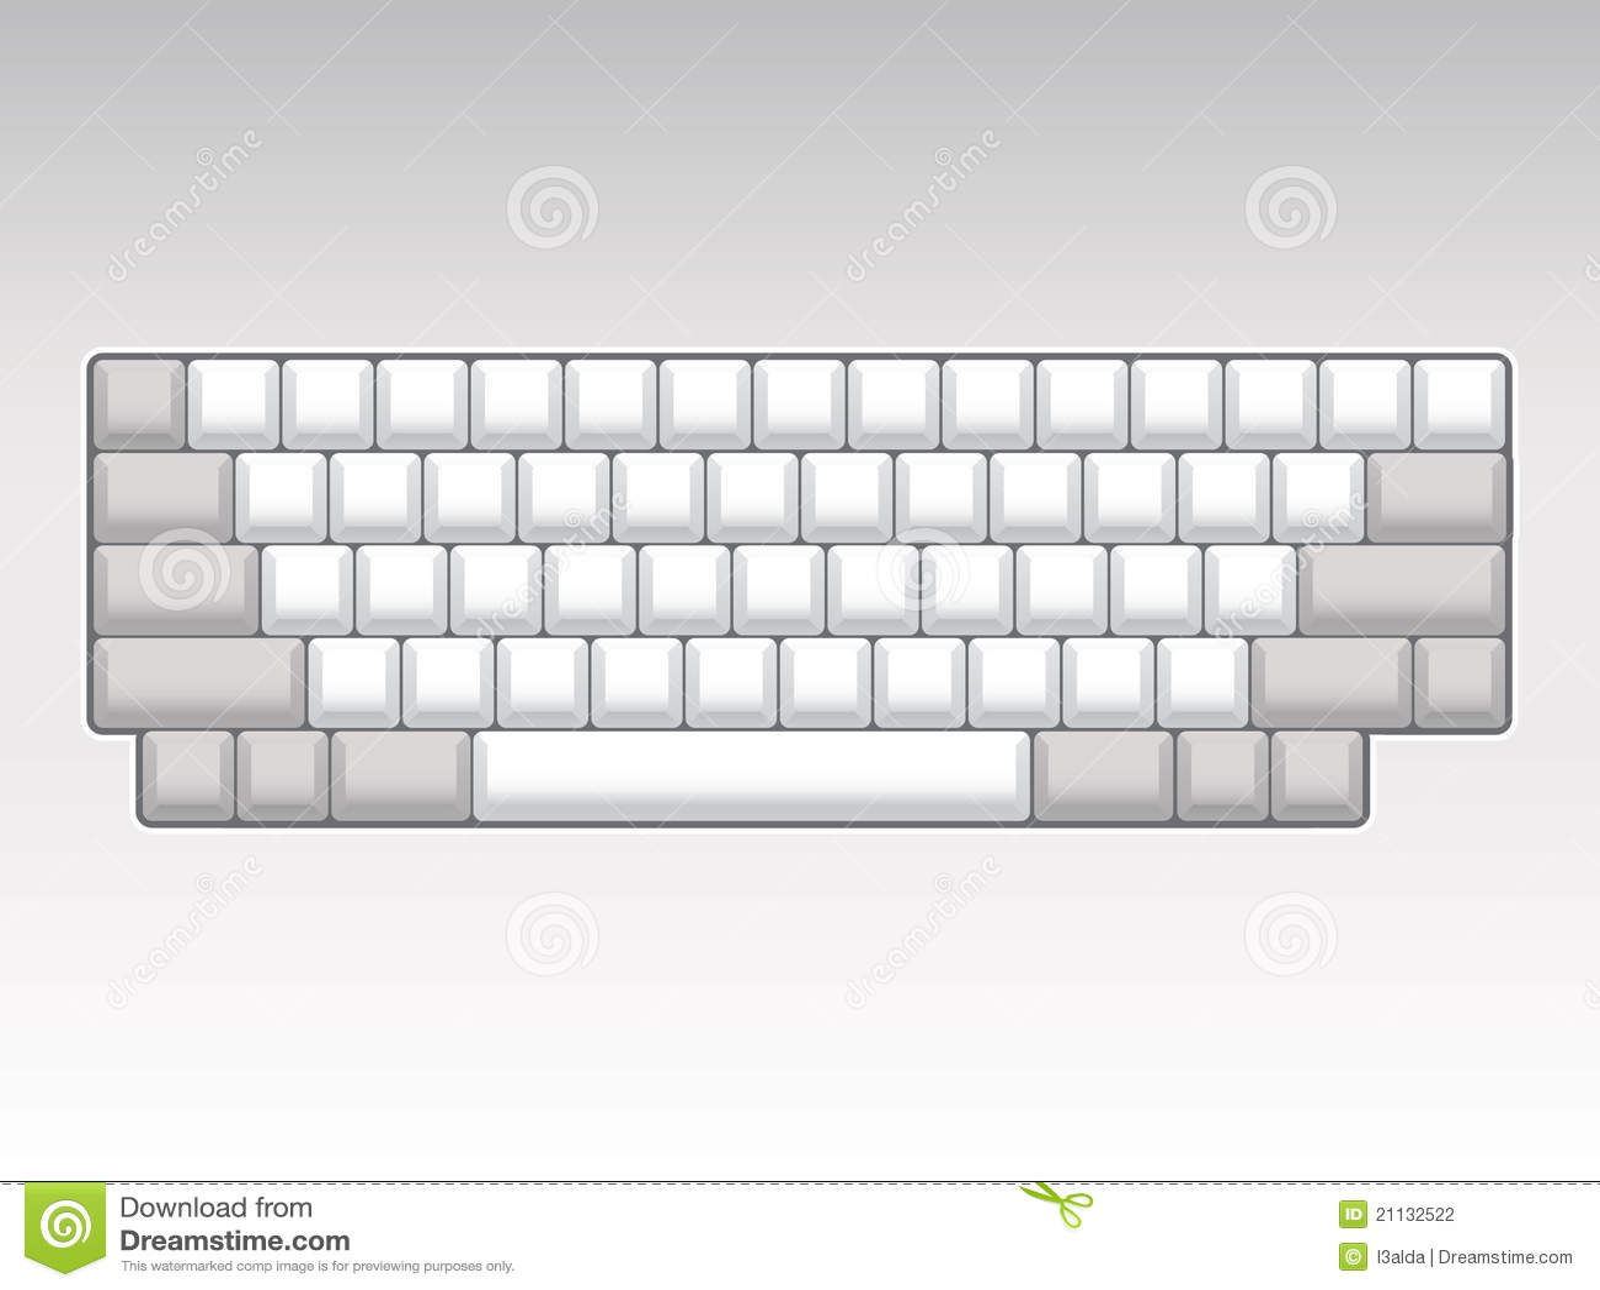 Blank Keyboard Layout Photography Image 21132522 – Blank Keyboard Worksheet